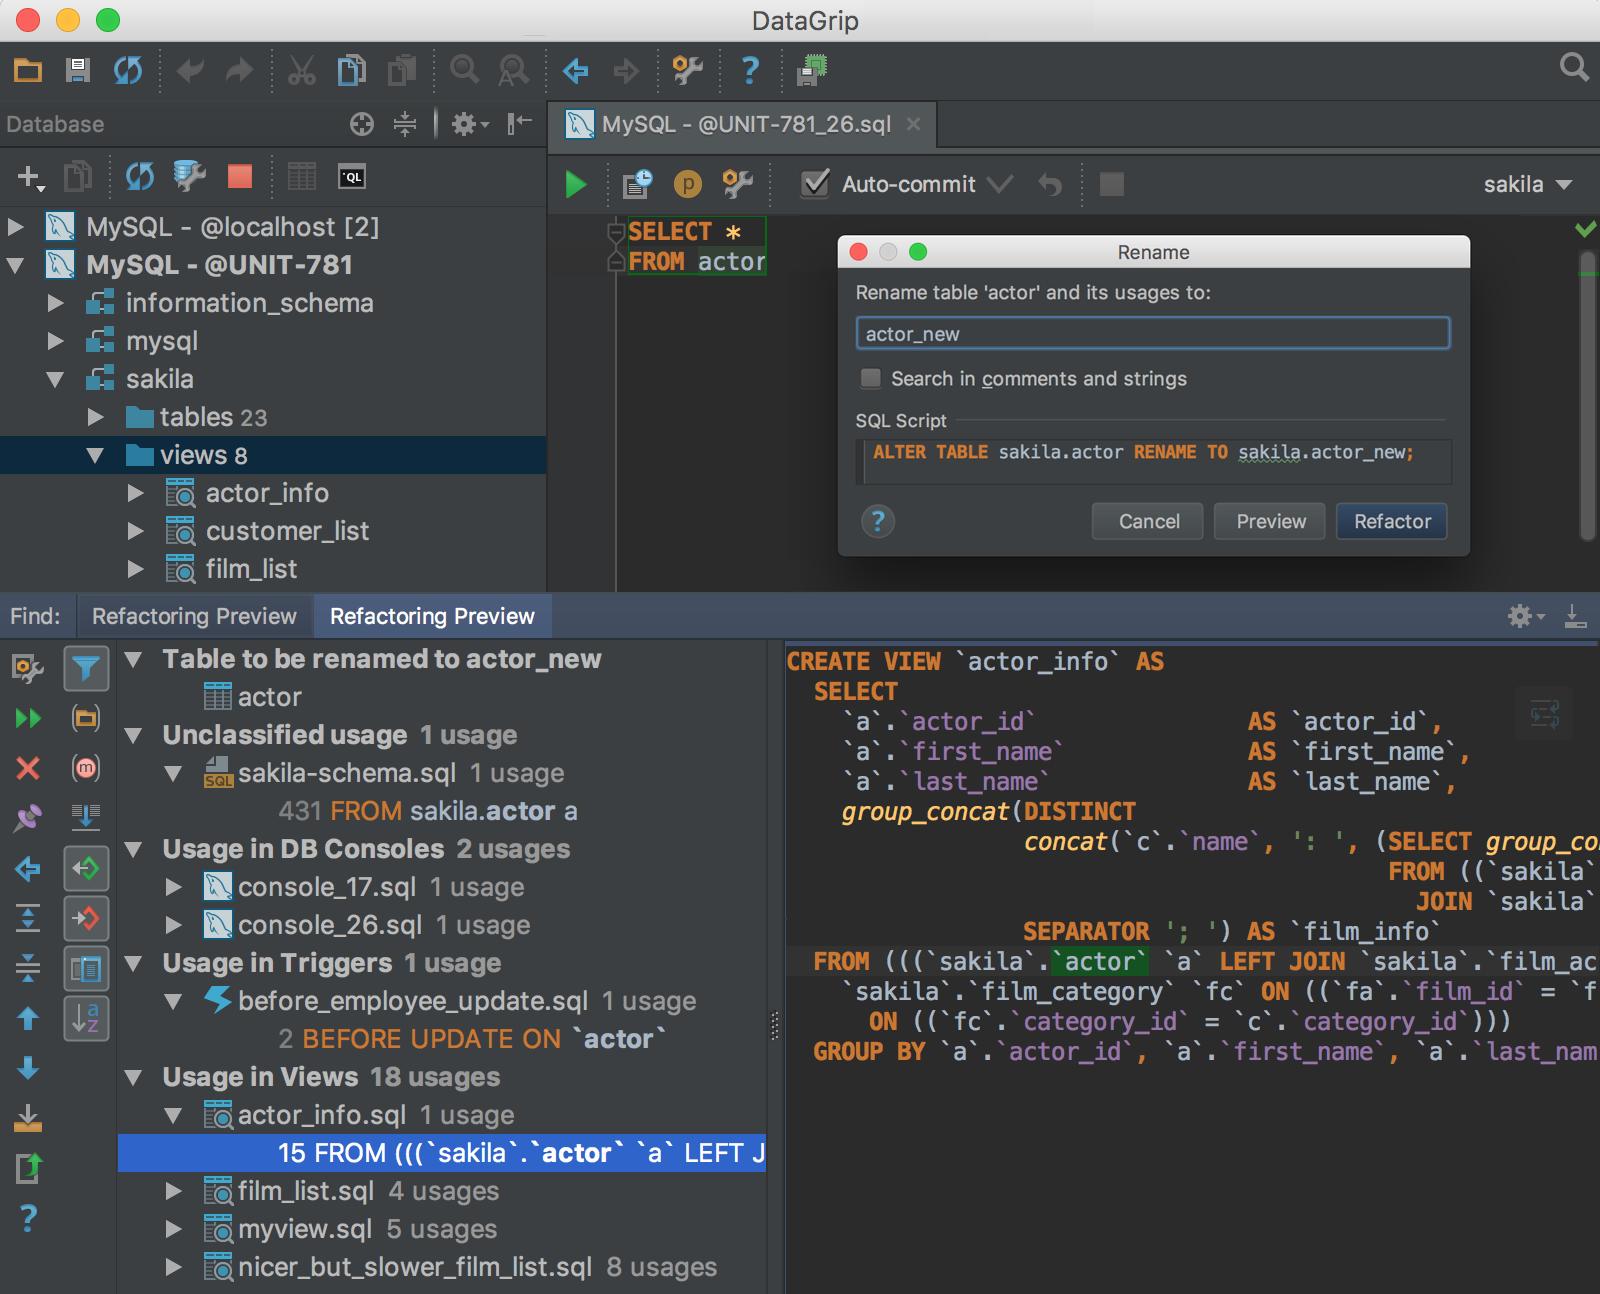 Screenshot for DataGrip